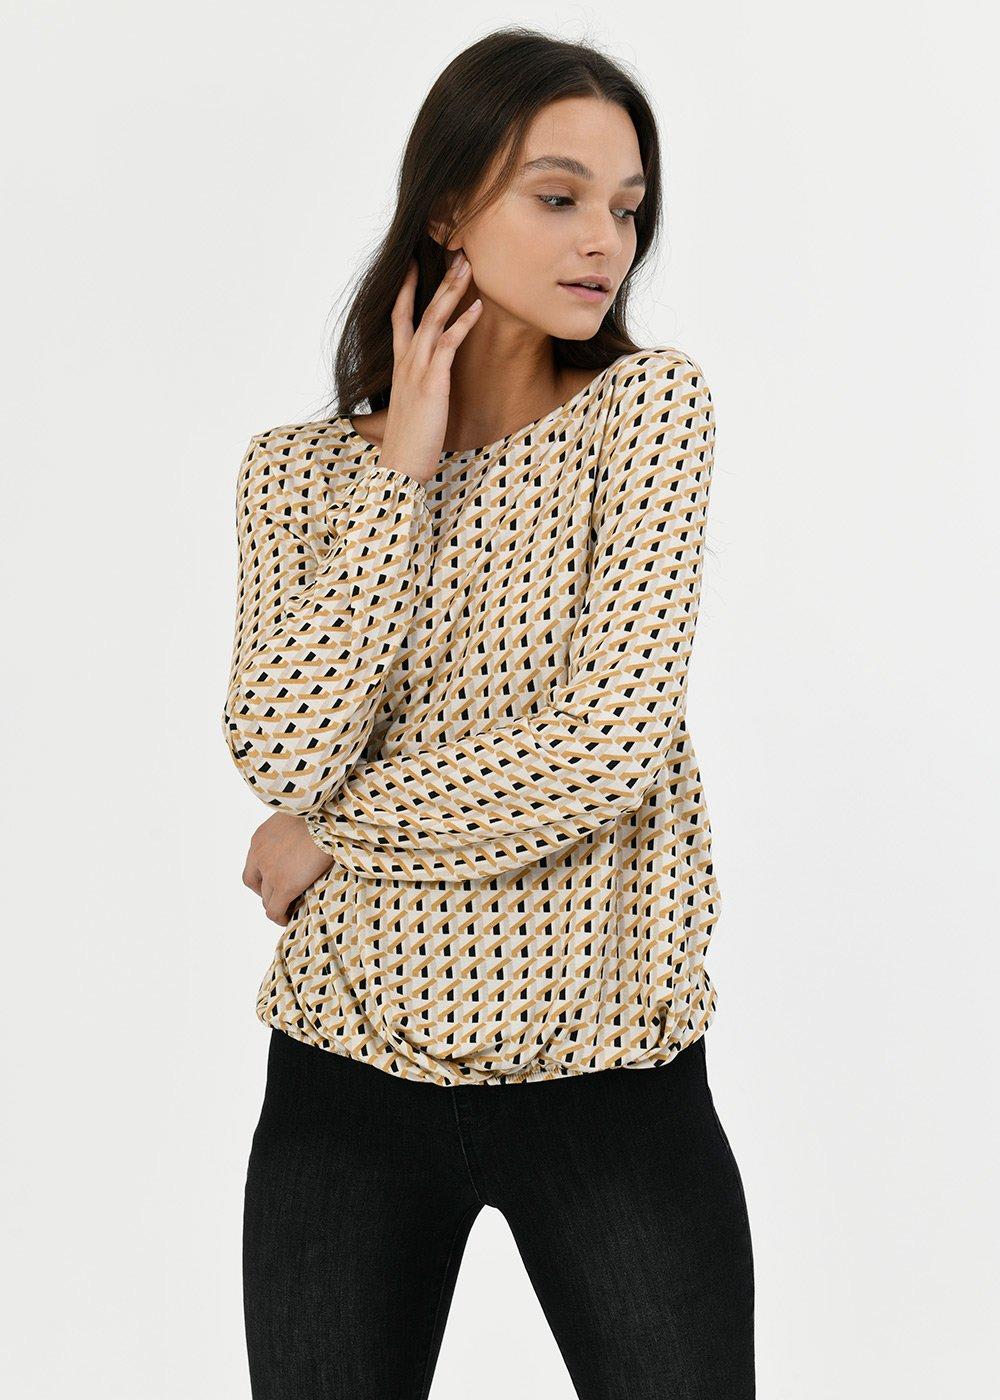 T-shirt Anna modello ovetto - Black /  Miele Fantasia - Donna